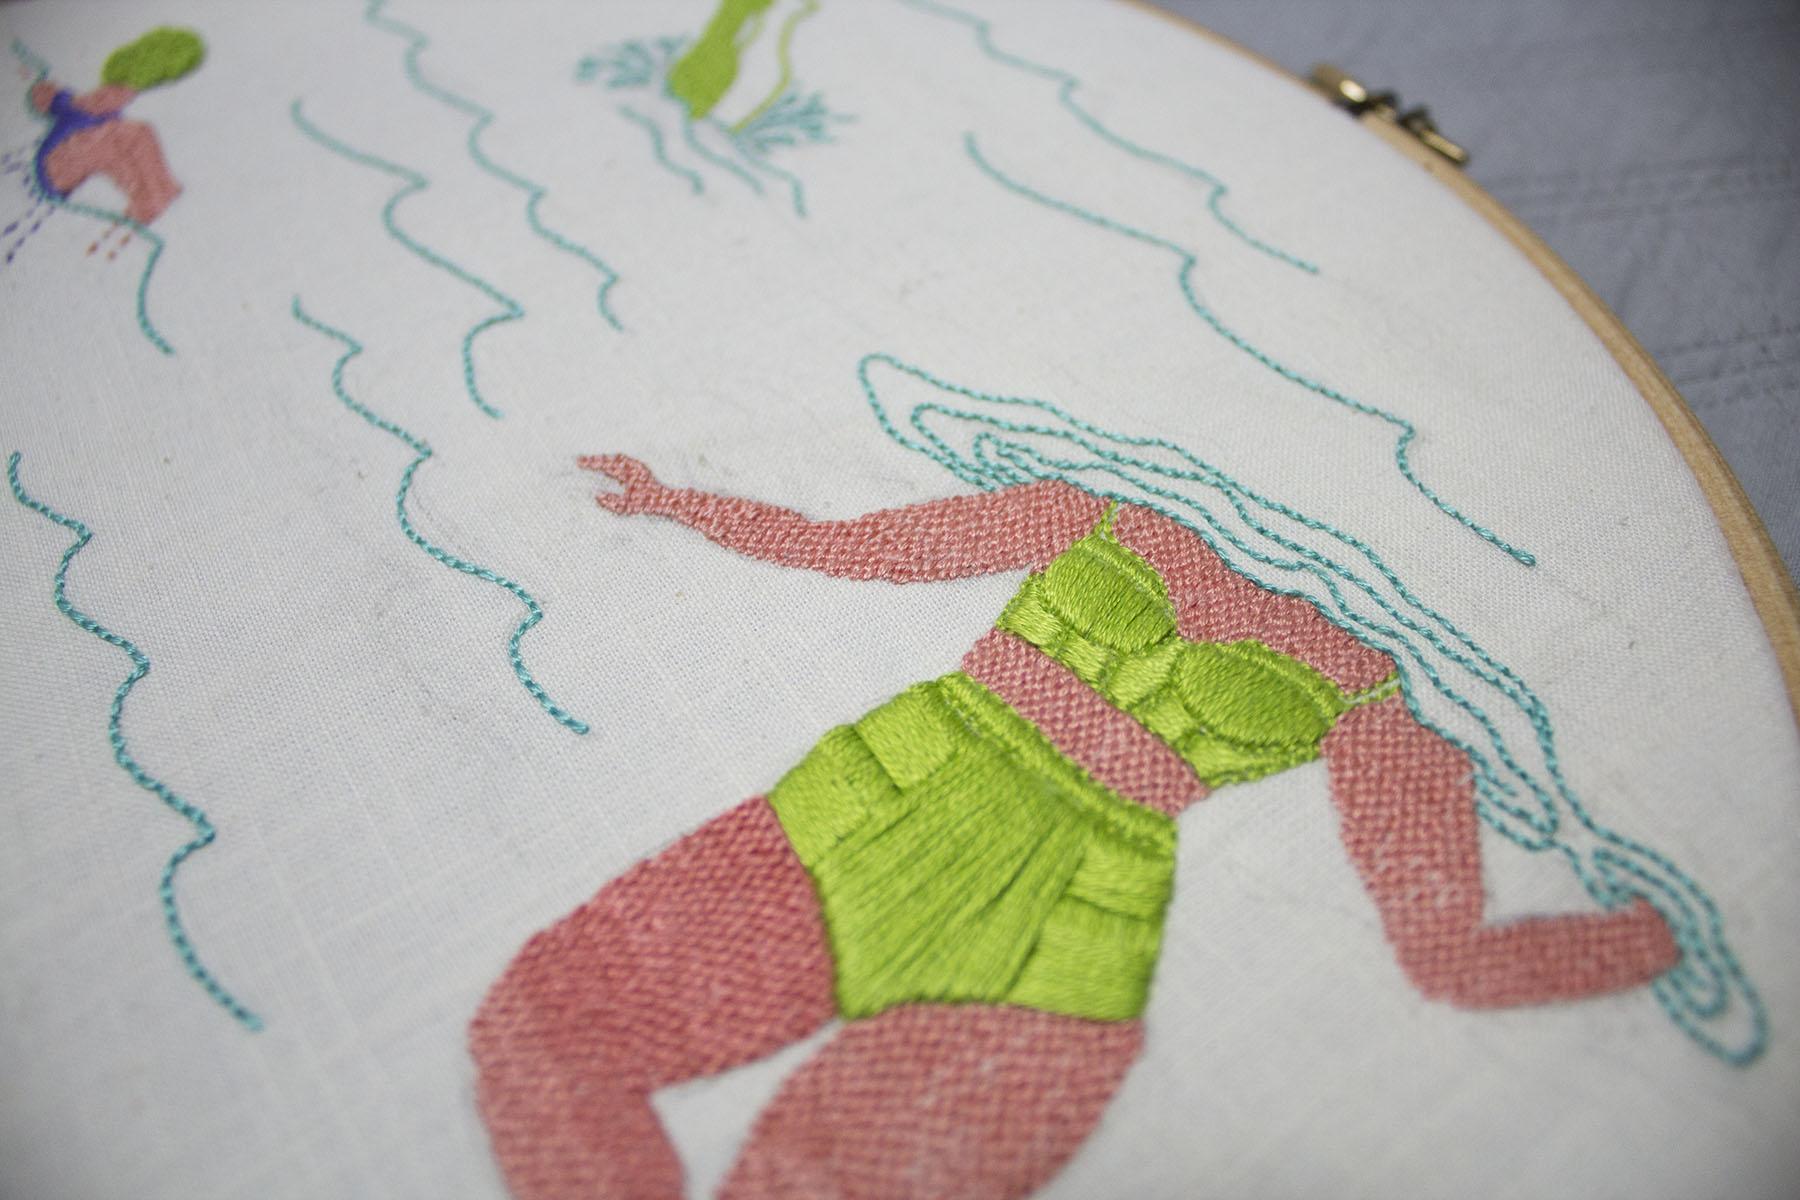 """Dive, Tread, Swim"" by Alanna Stapleton"